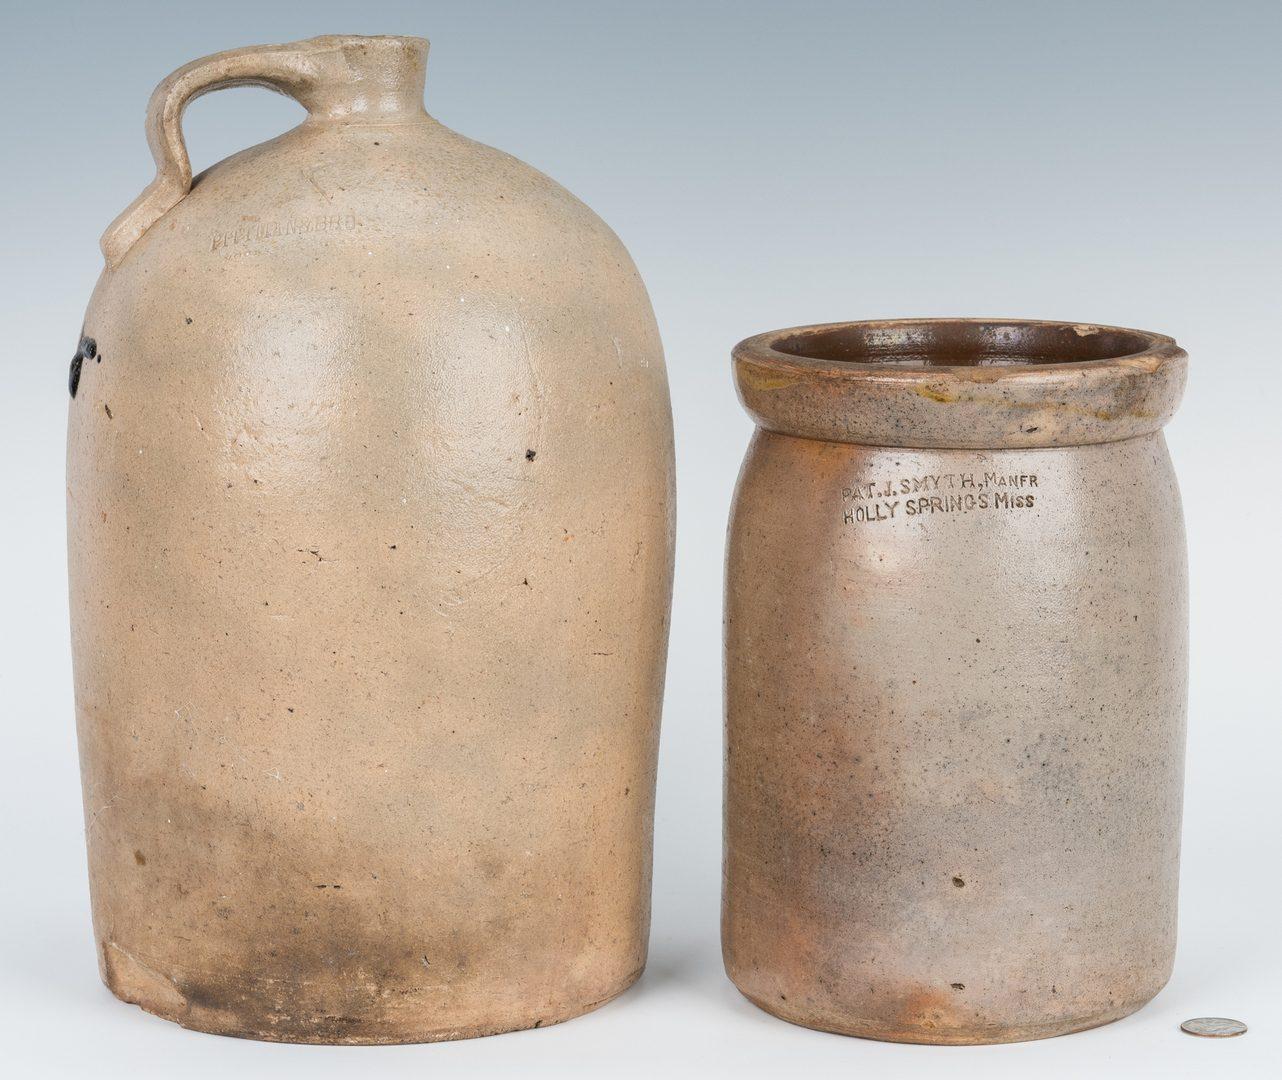 Lot 186: 2 Southern Stoneware Pottery Jars, Alabama & Mississippi